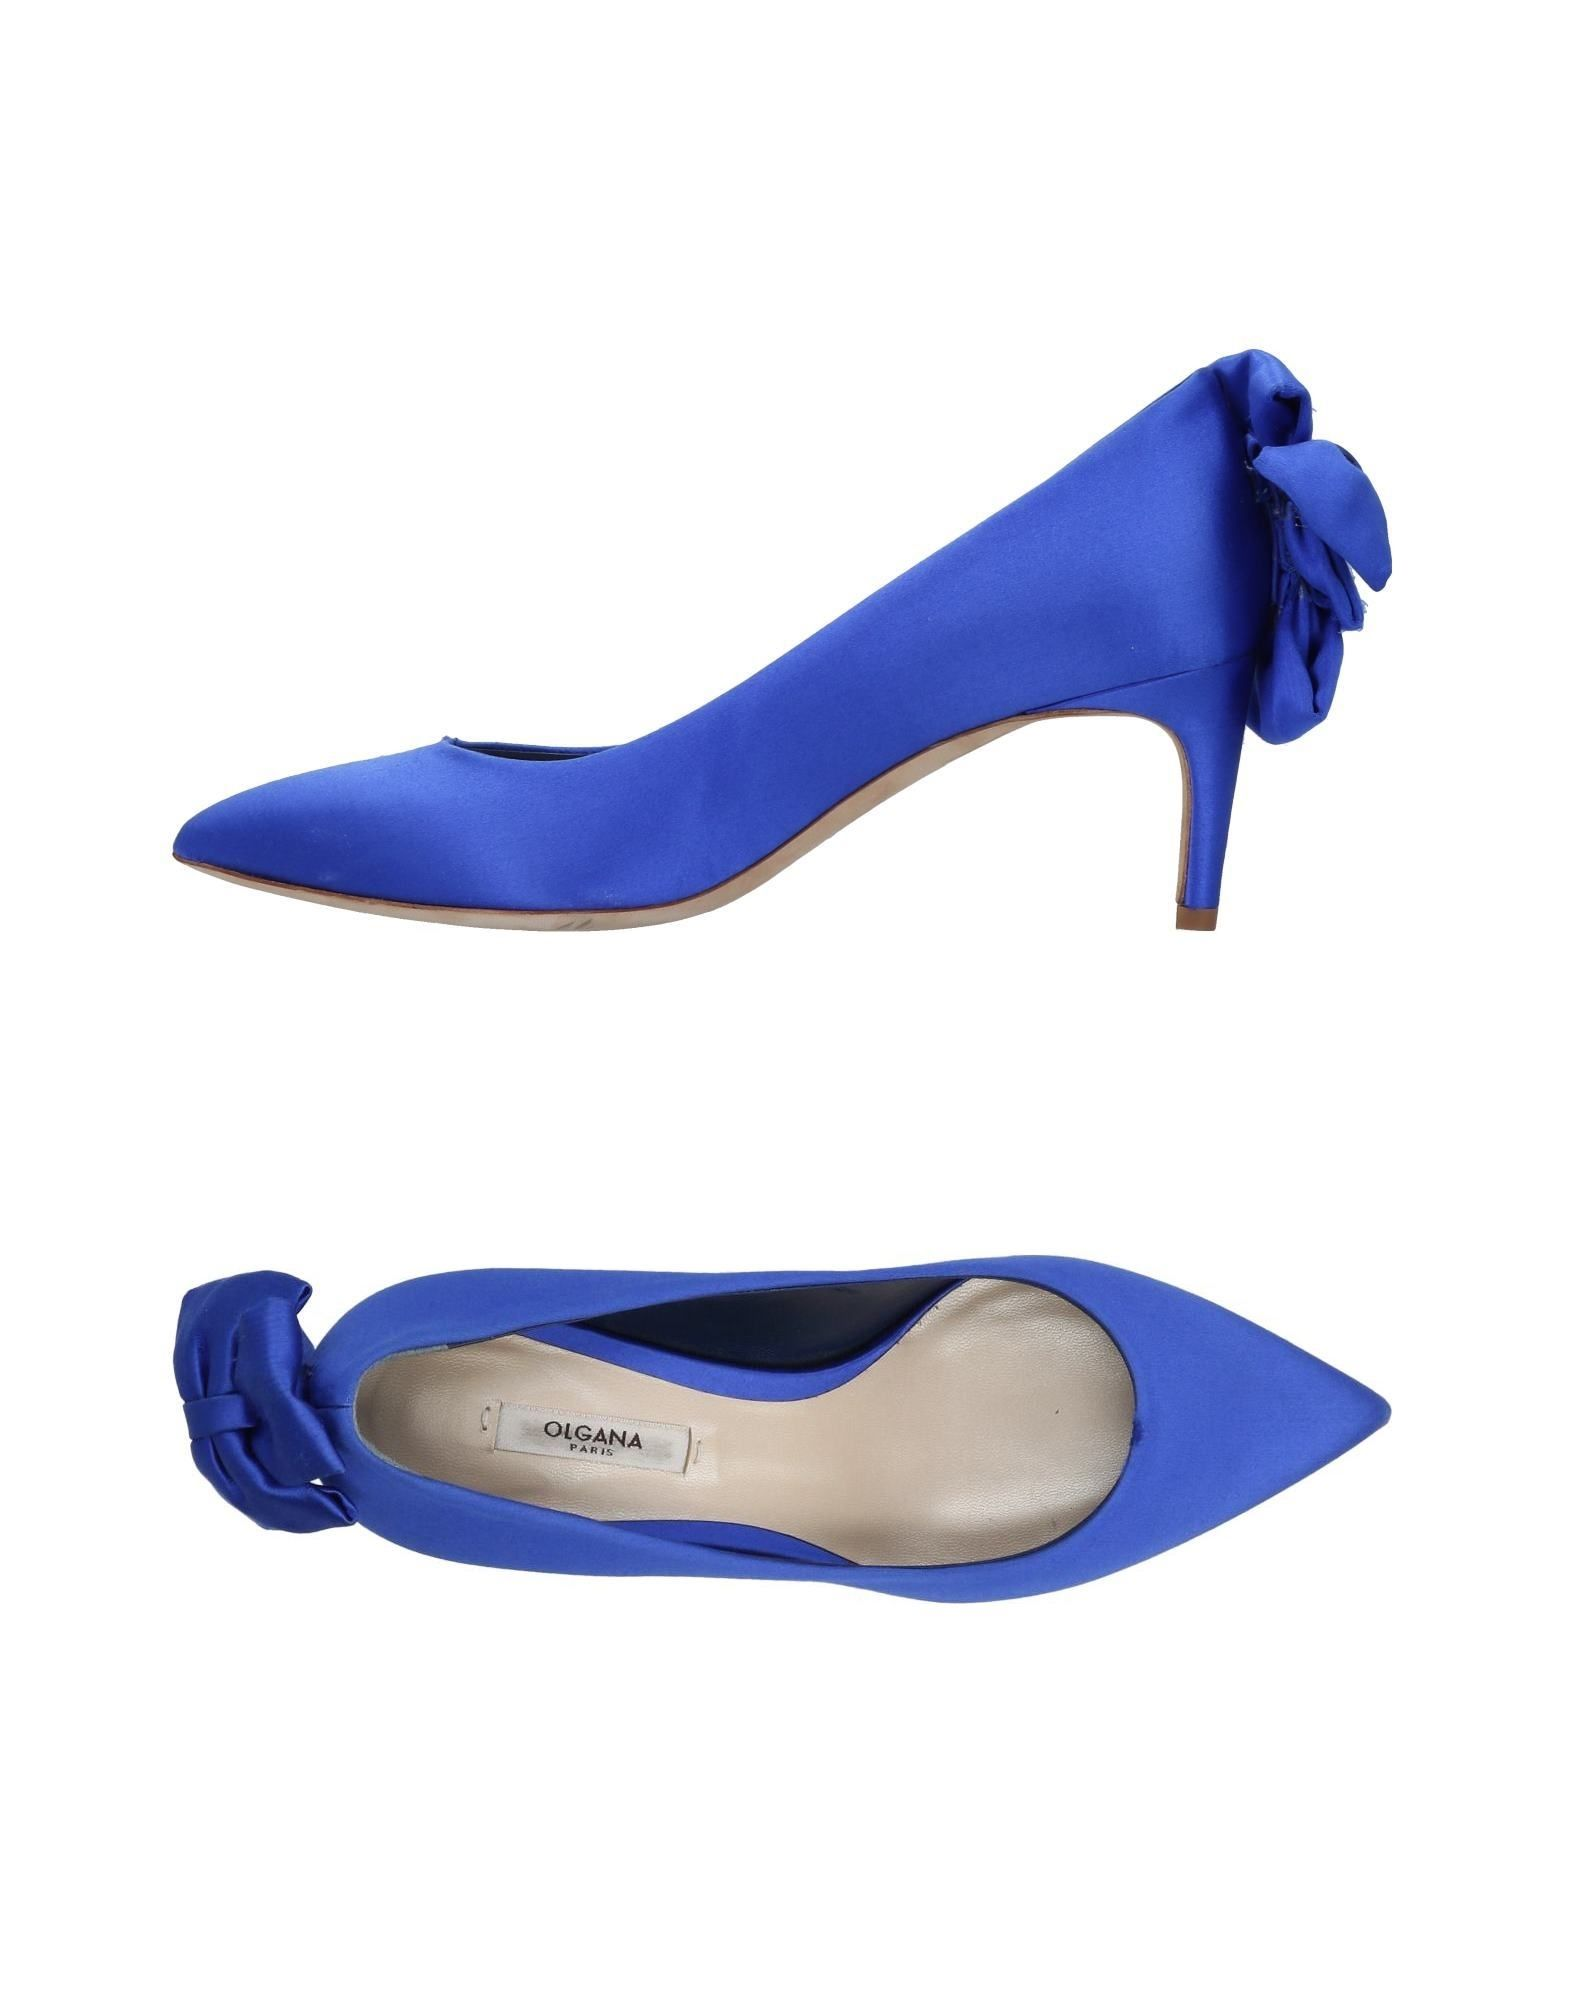 Stilvolle billige Damen Schuhe Olgana Paris Pumps Damen billige  11444153AK 25b54a